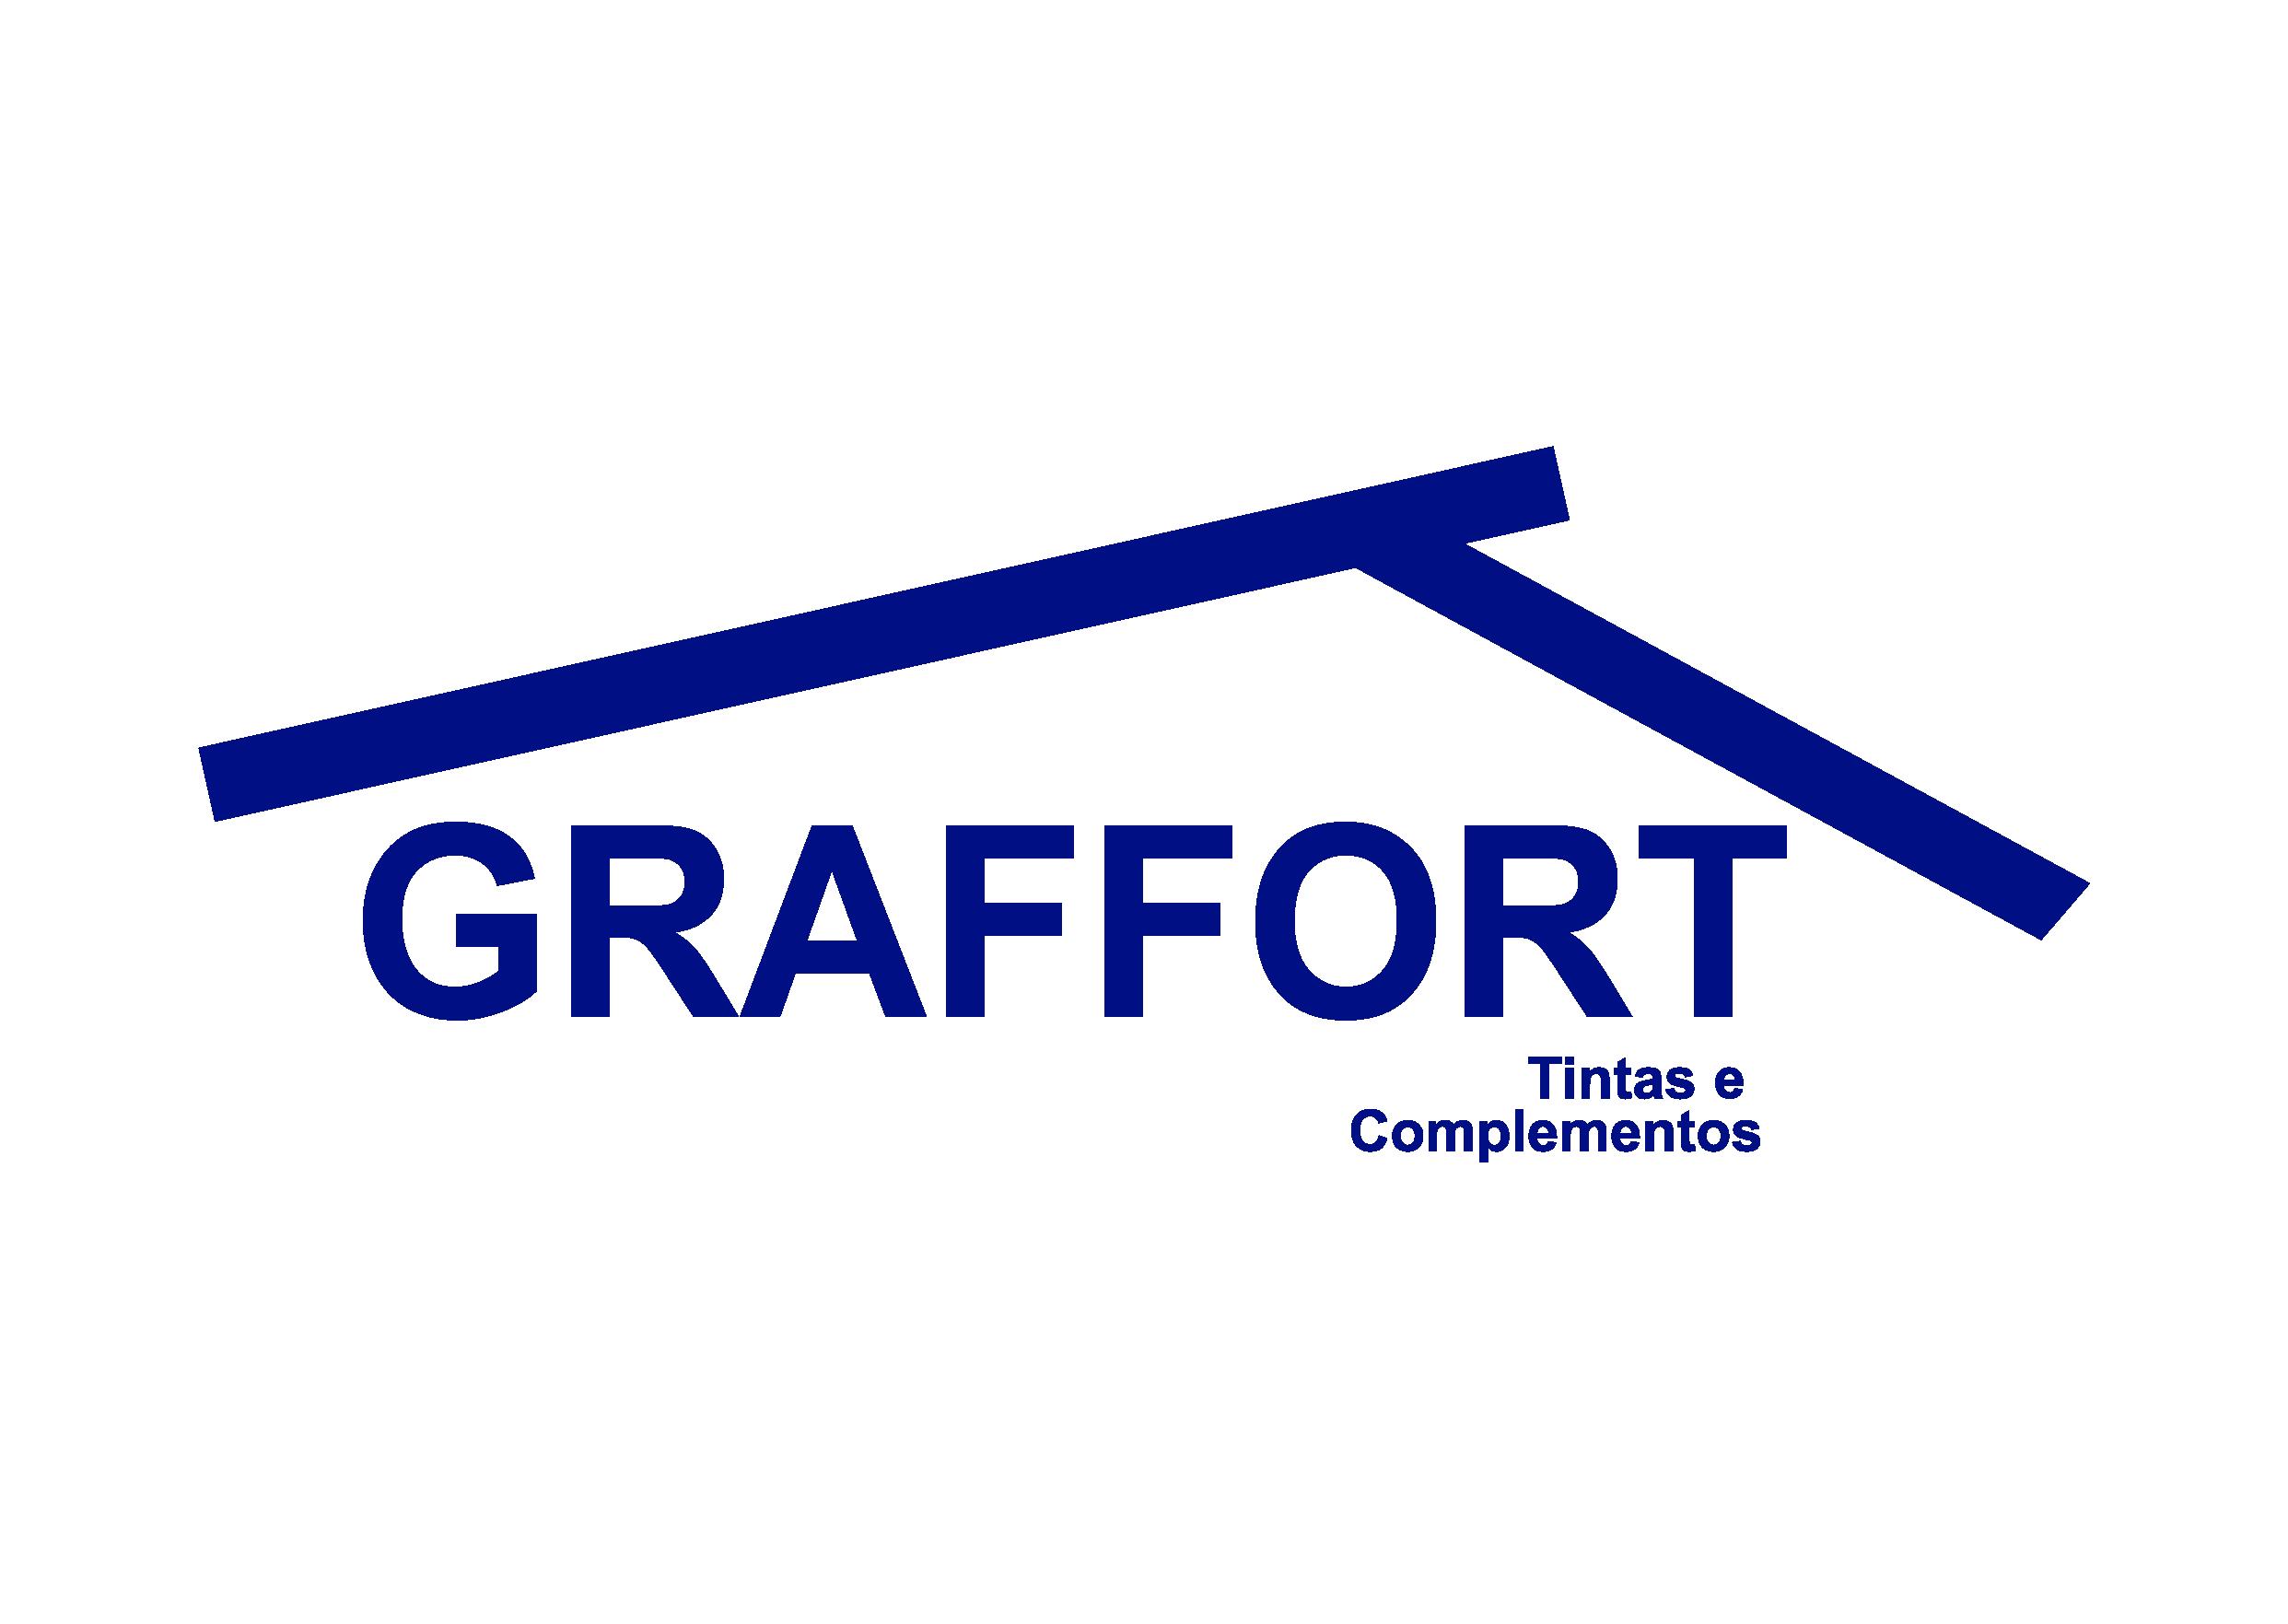 GRAFFORT_Prancheta 1-01